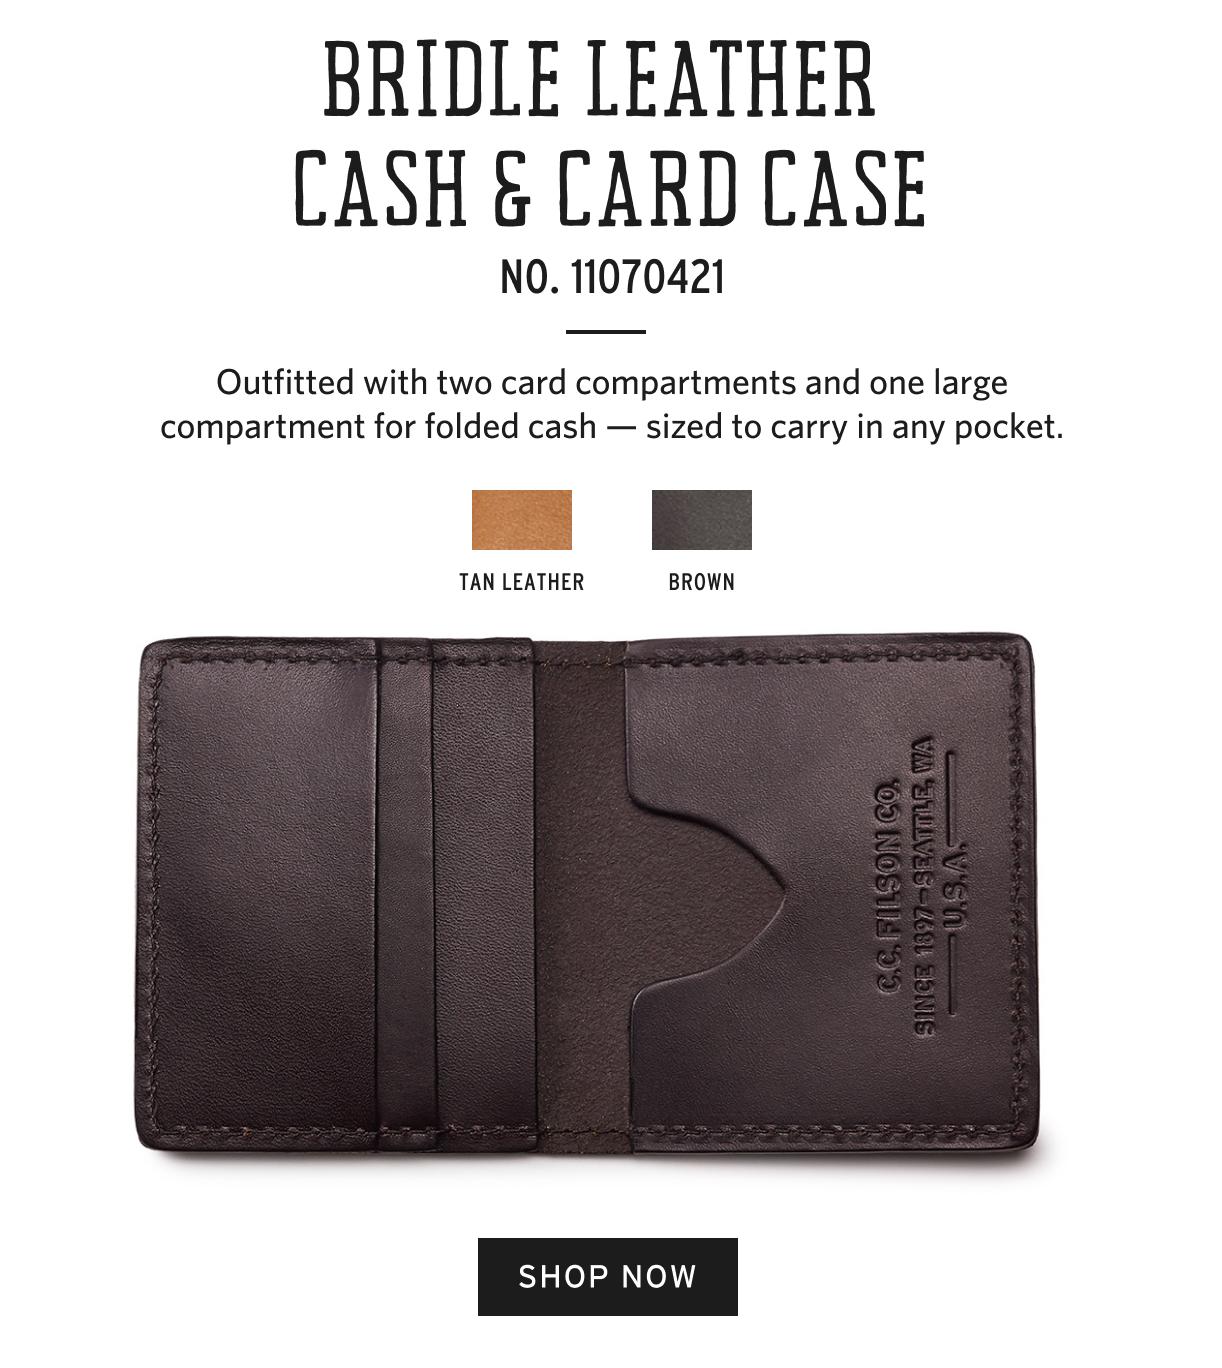 SHOP WALLETS & CARD CASES